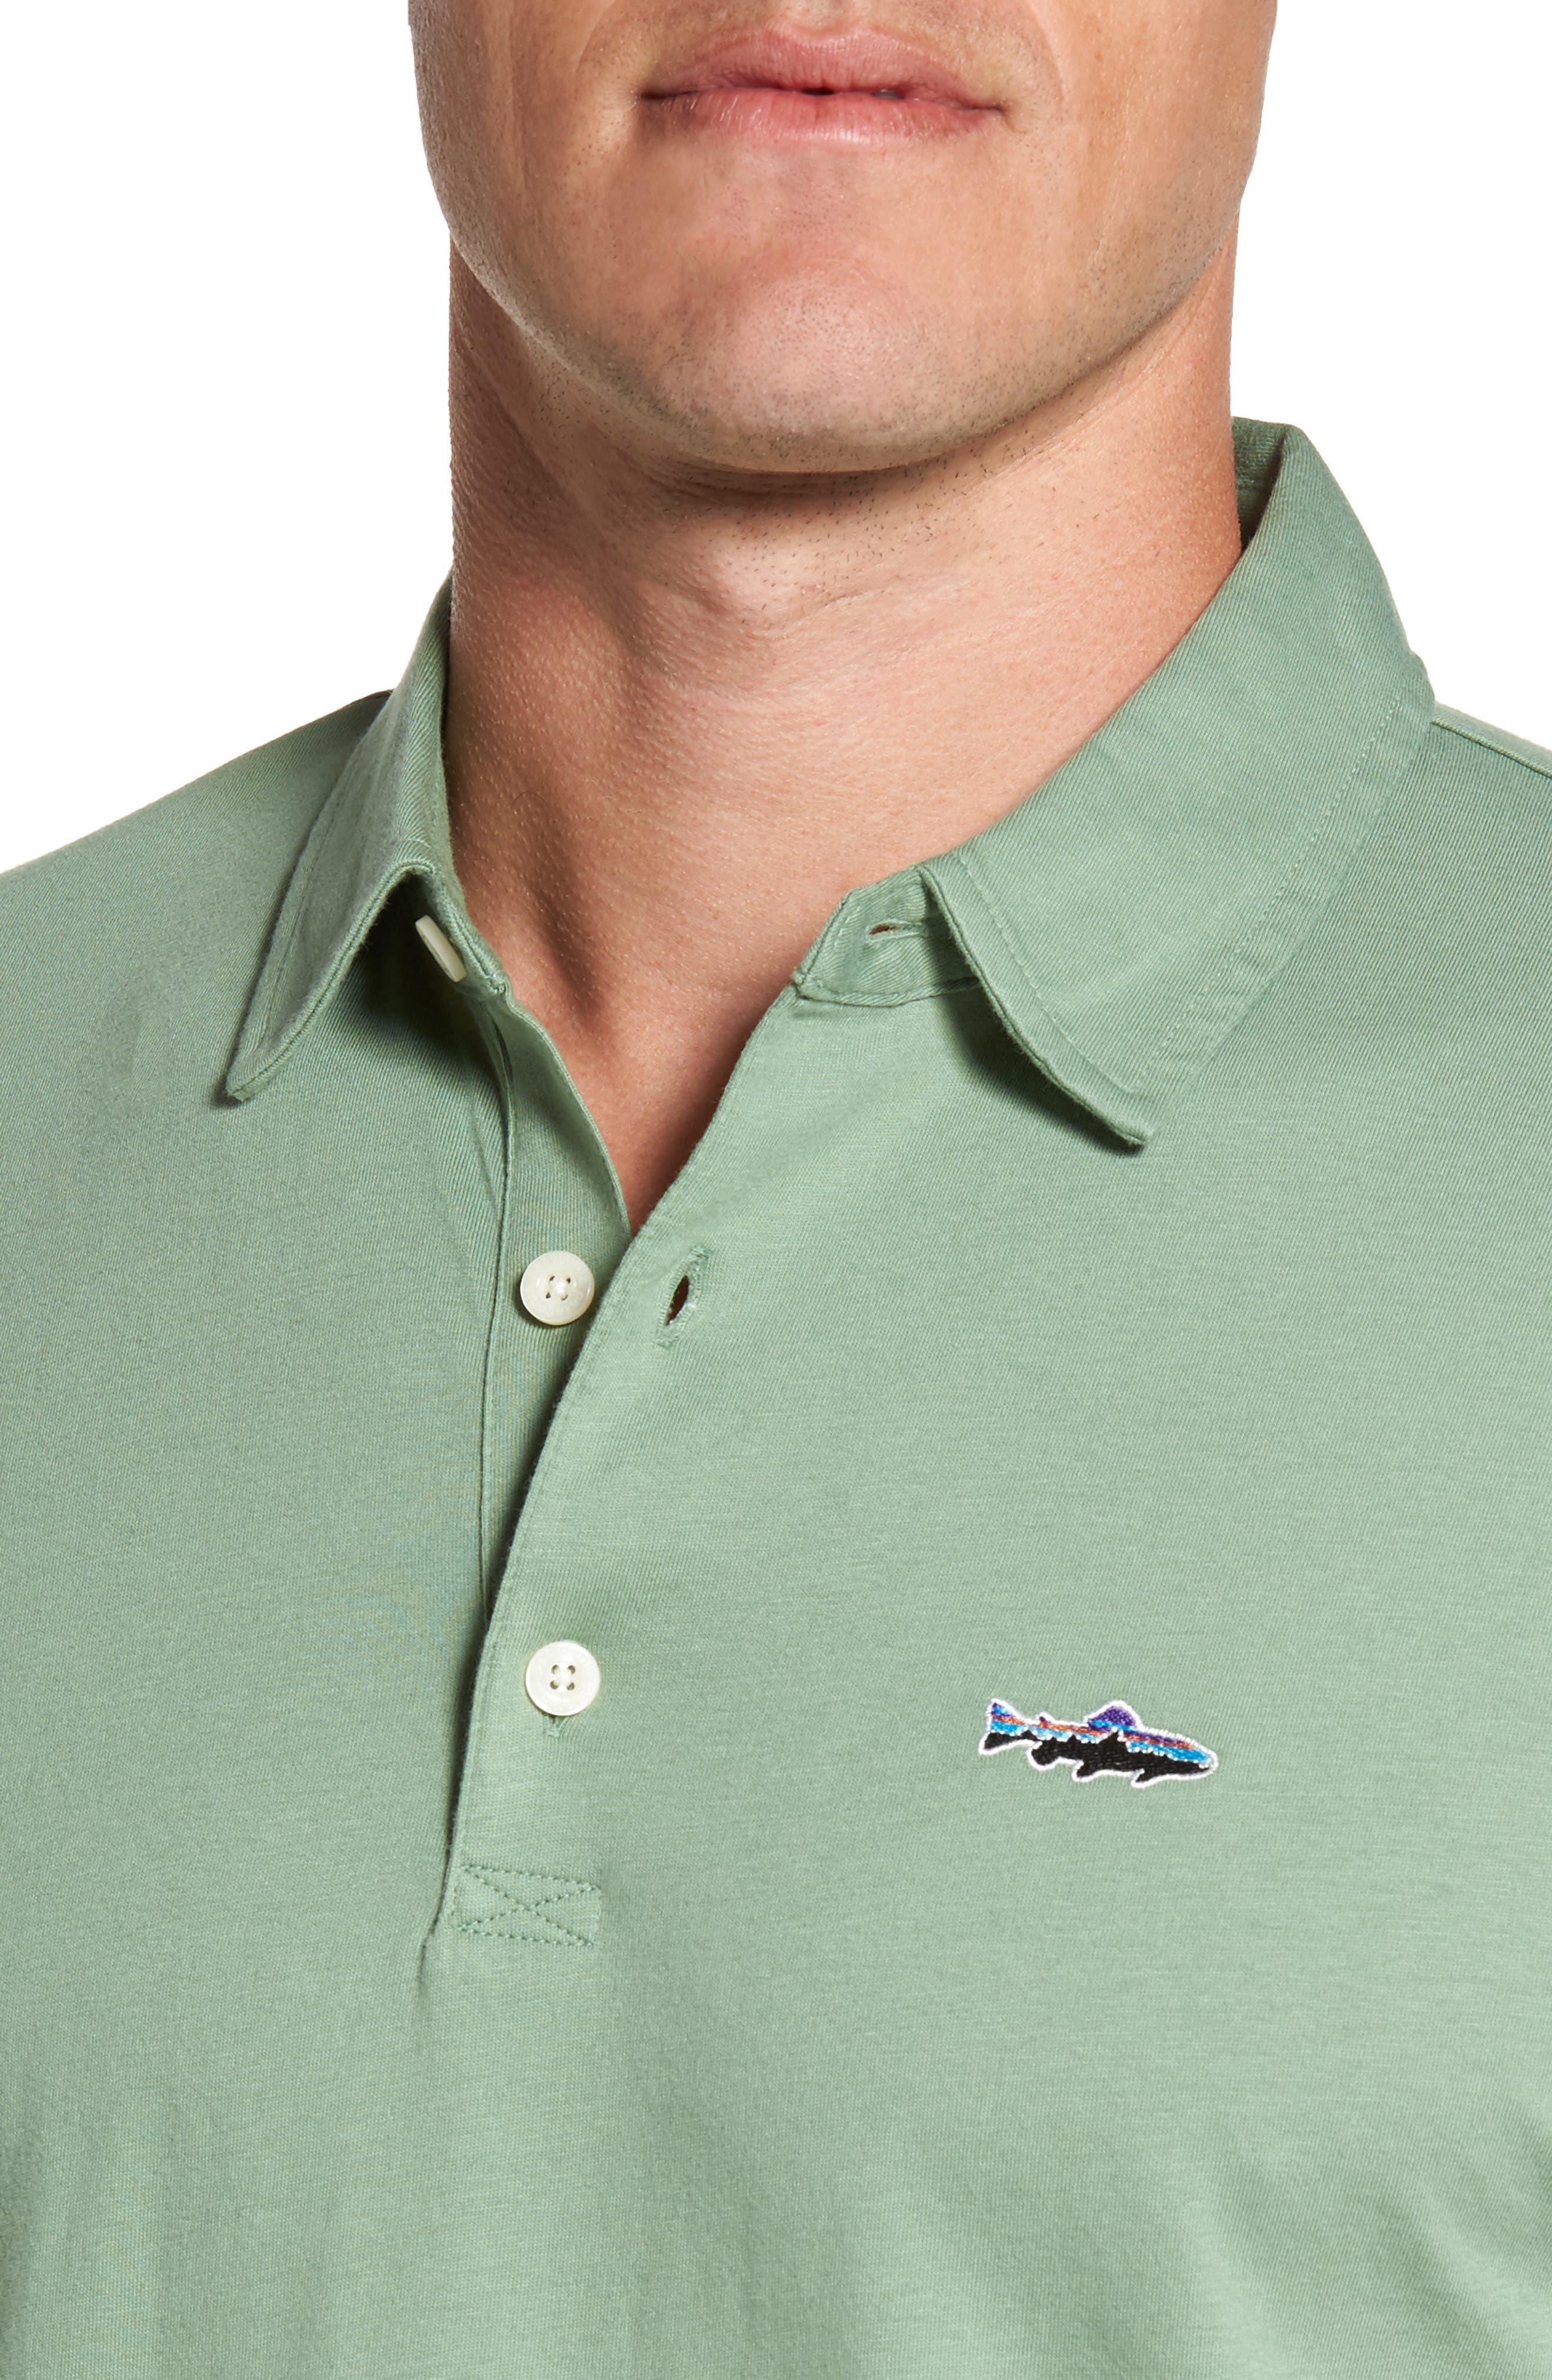 'Trout Fitz Roy' Organic Cotton Polo,                             Alternate thumbnail 4, color,                             307